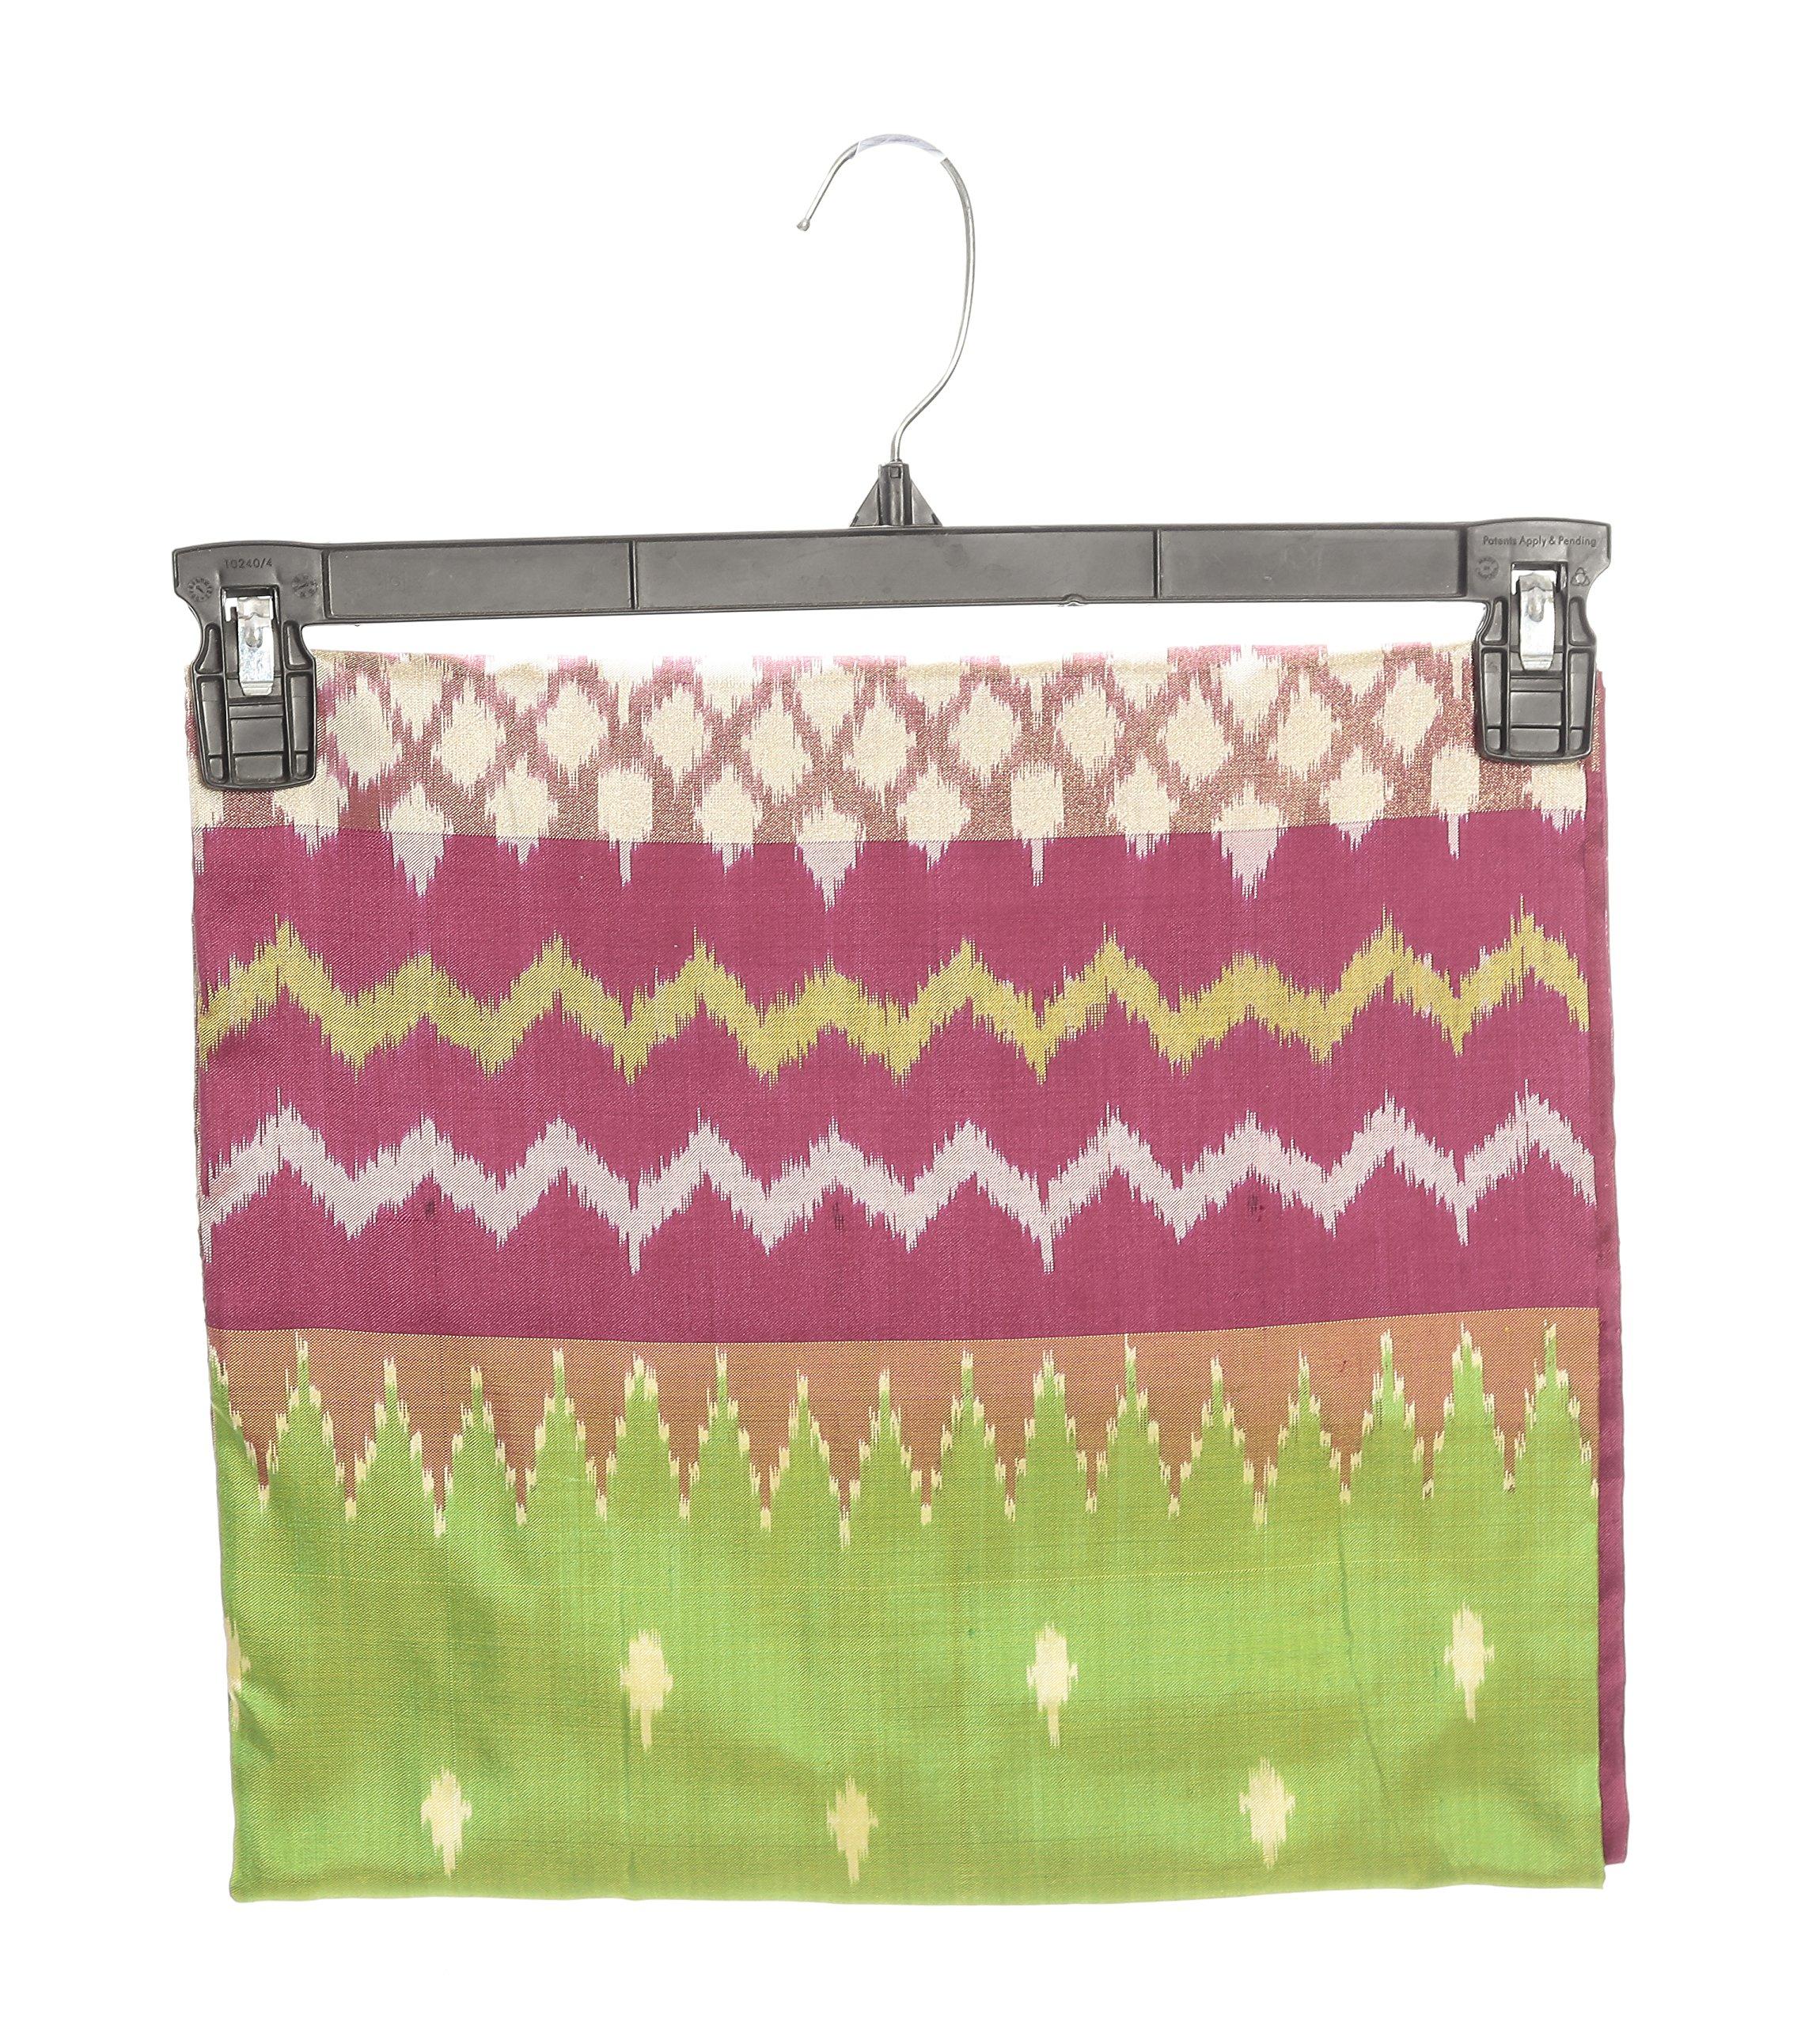 Mandakini — Indian Women's Pochampally - Handloom - Ikat Pure Silk Saree (Pink-Green ) (MK303) by Mandakini (Image #6)